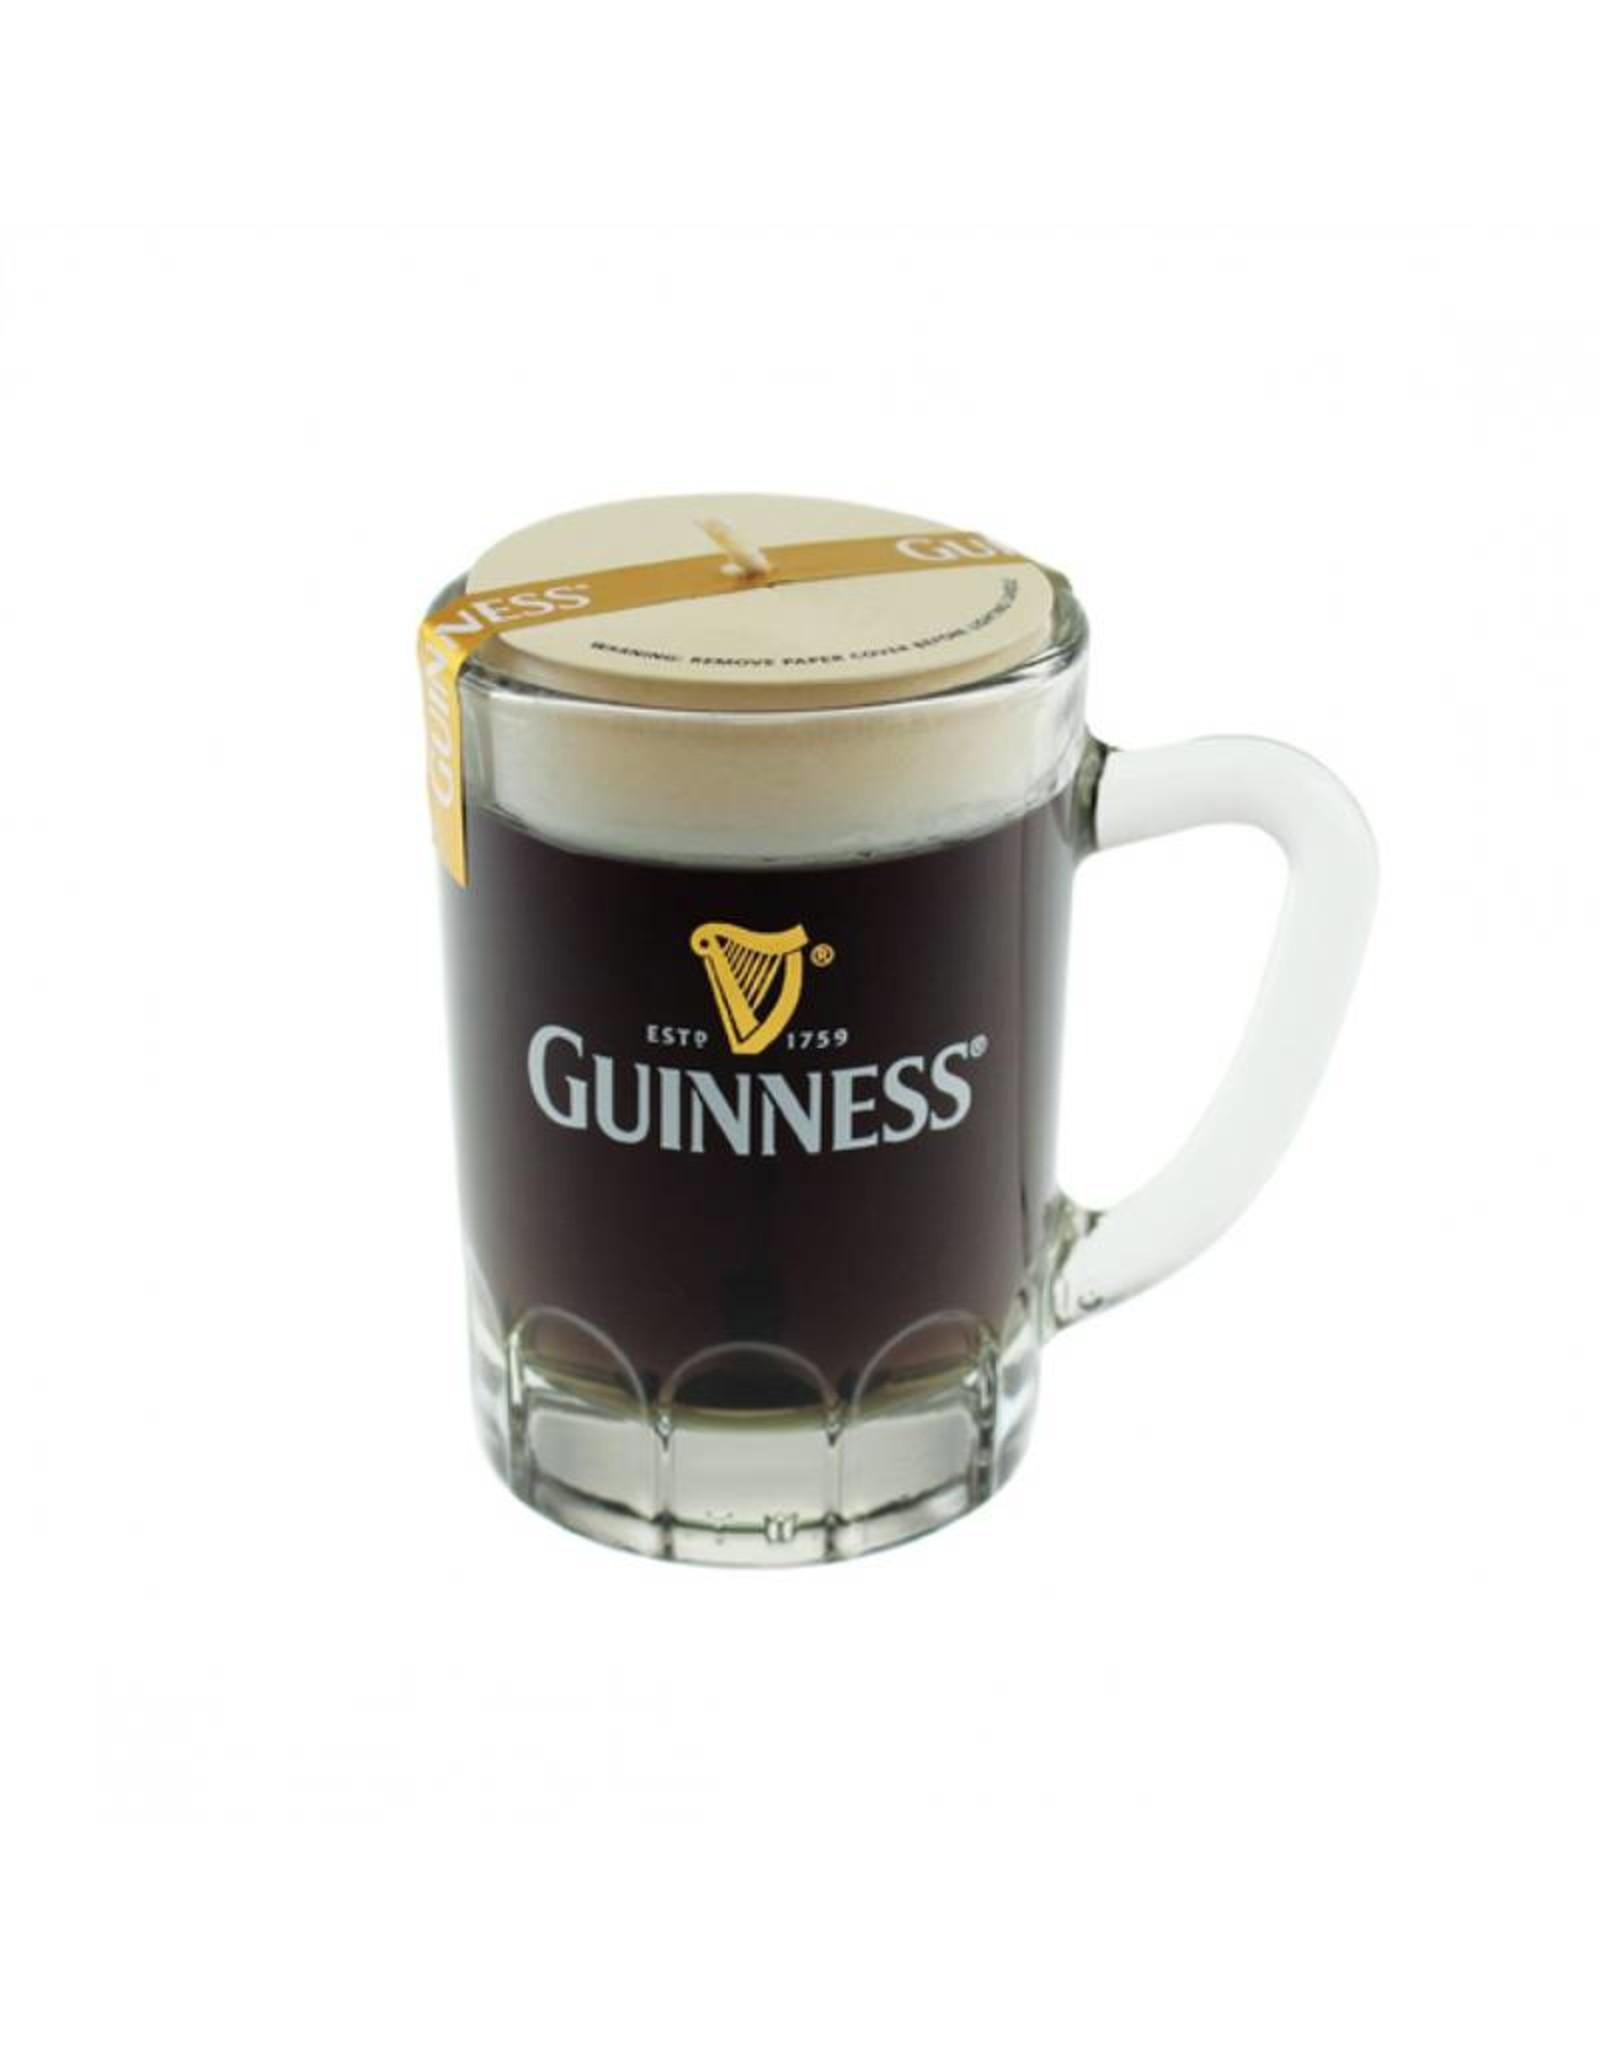 Guinness Guinness Mini Tankard Candle